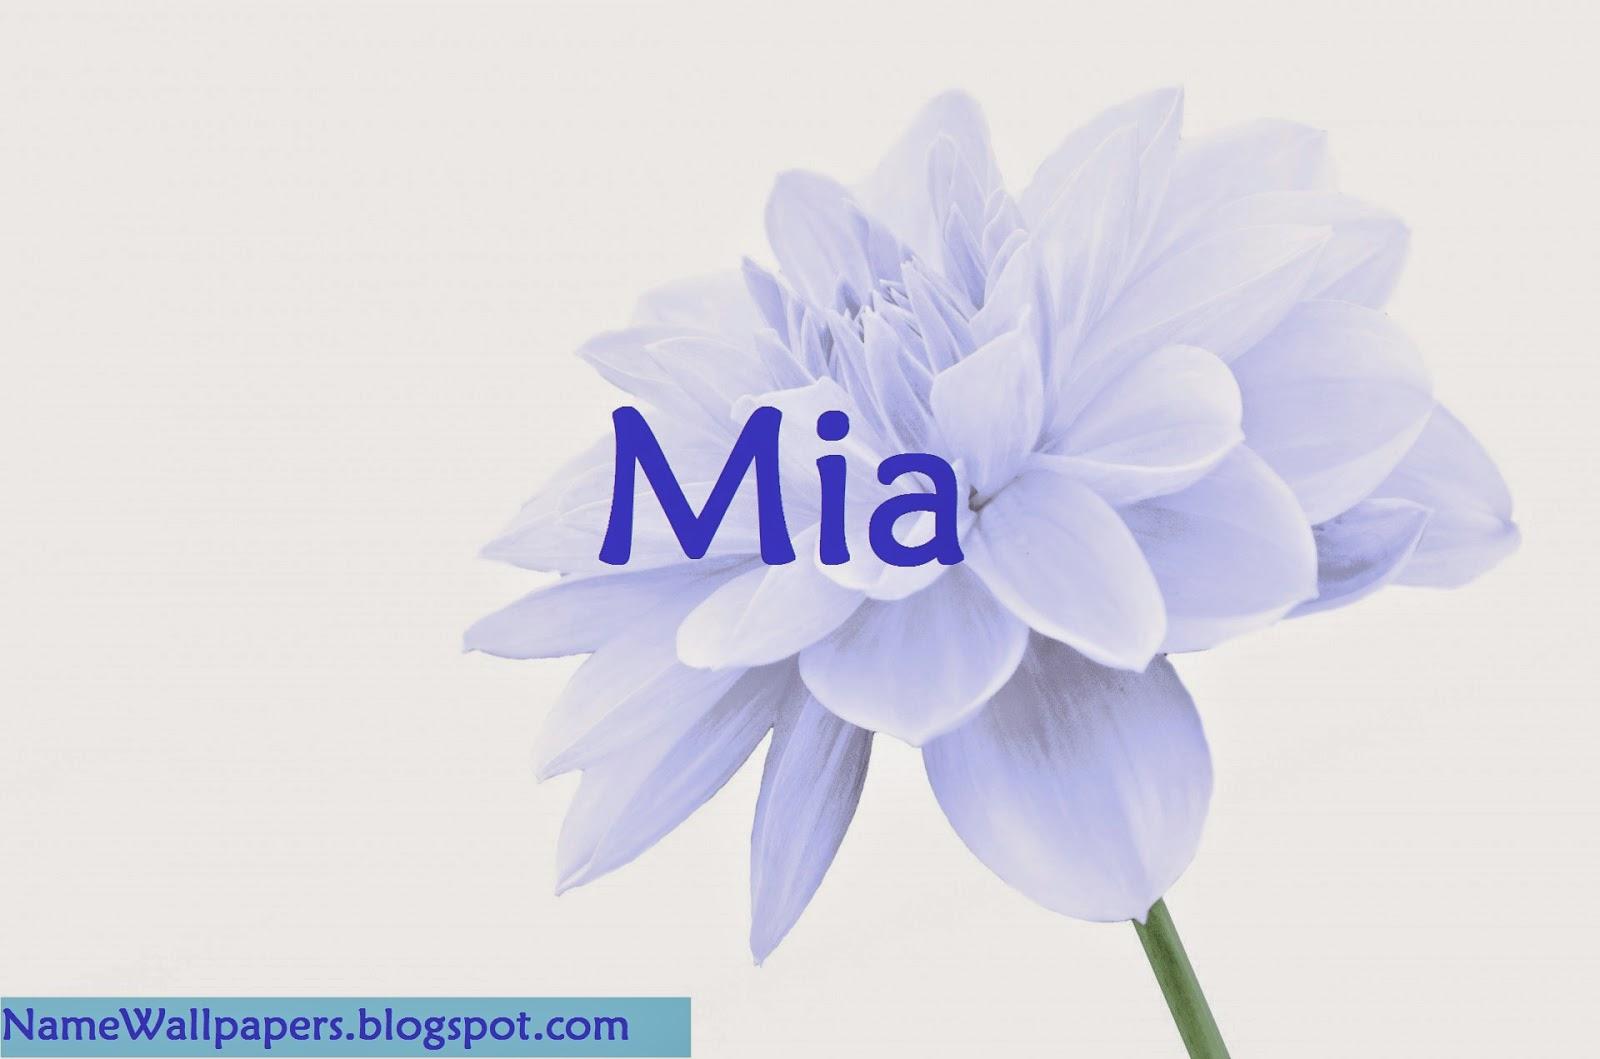 Mia Name Wallpapers Mia ~ Name Wallpaper Urdu Name Meaning ...